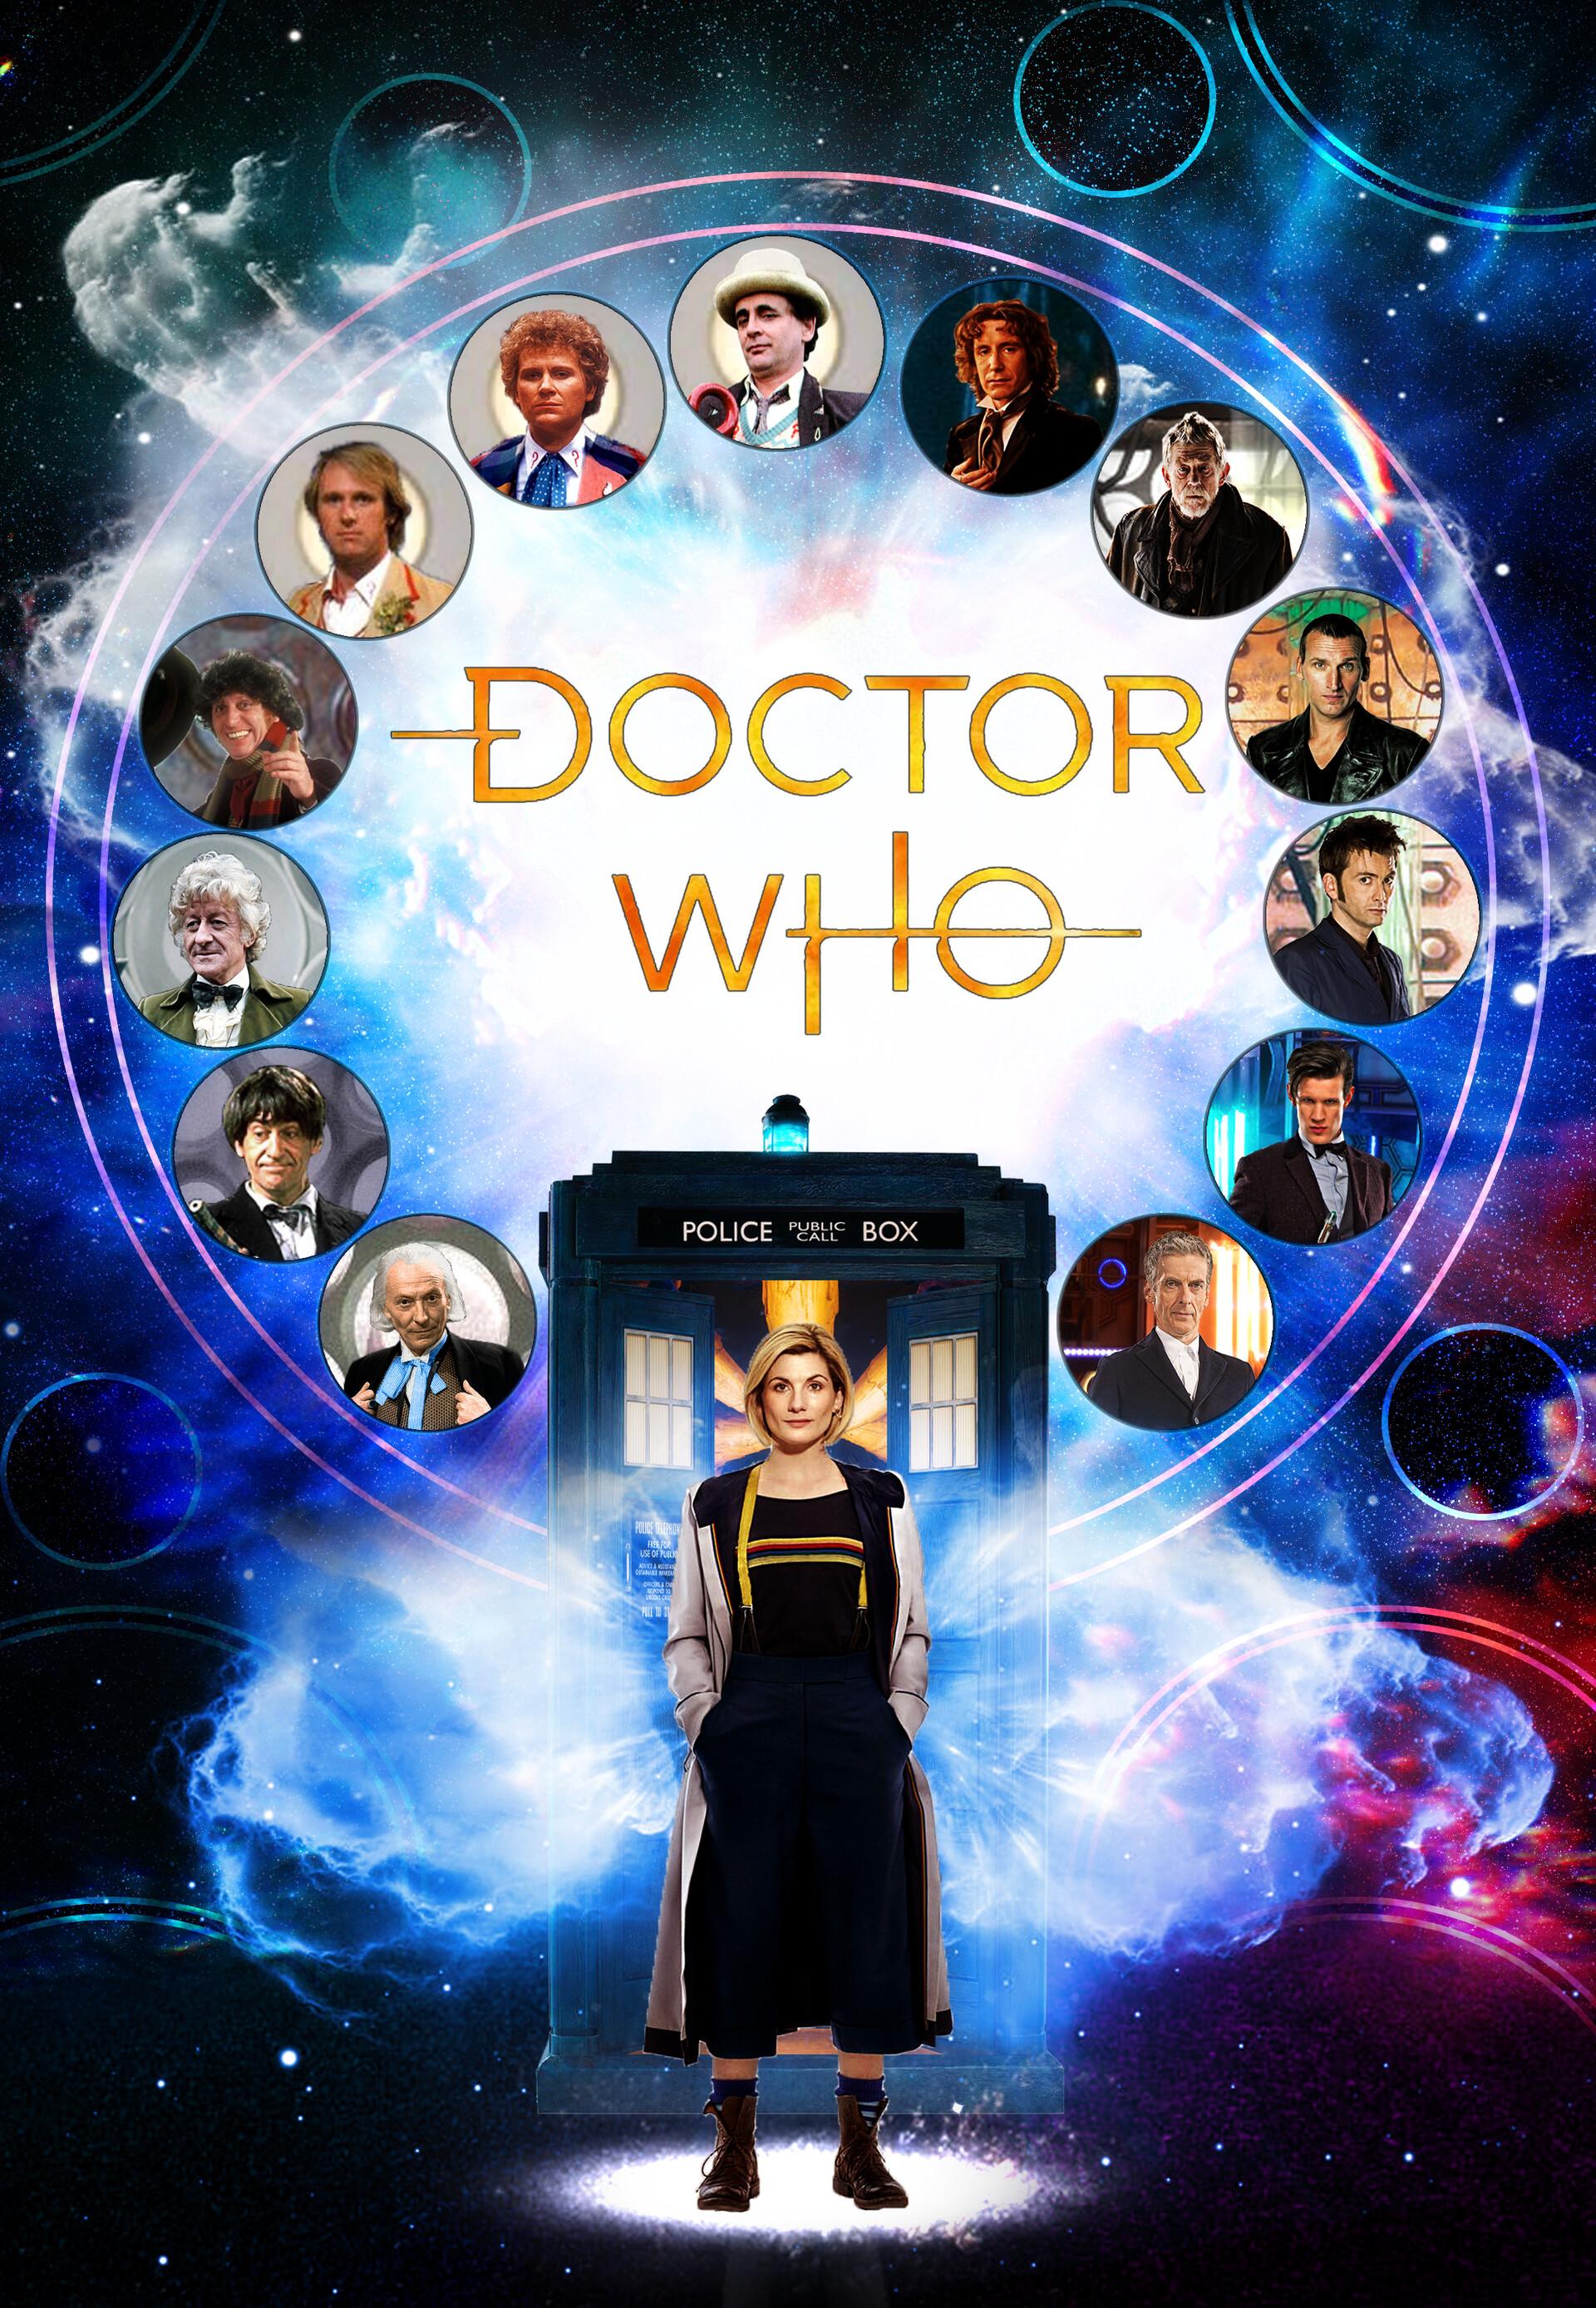 joseph atkinson doctor who poster 8